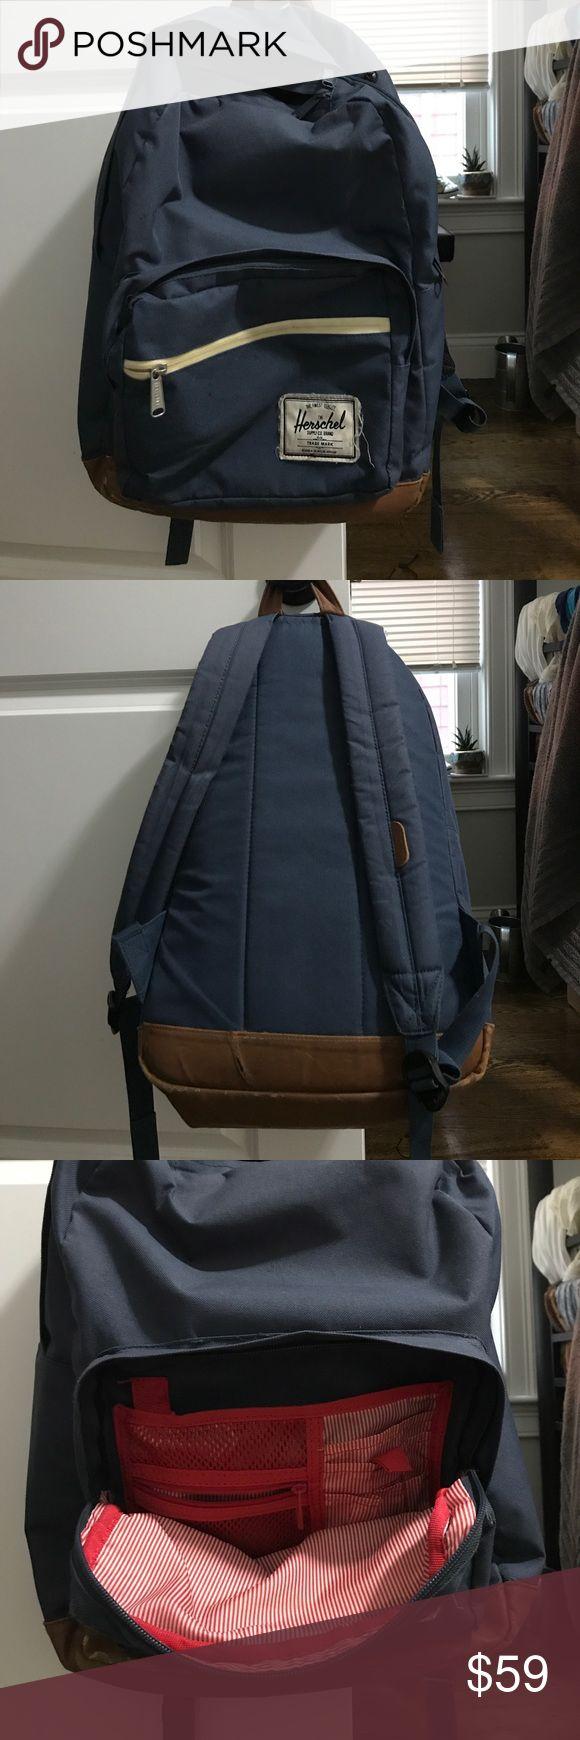 Best 25+ Herschel backpack ideas on Pinterest